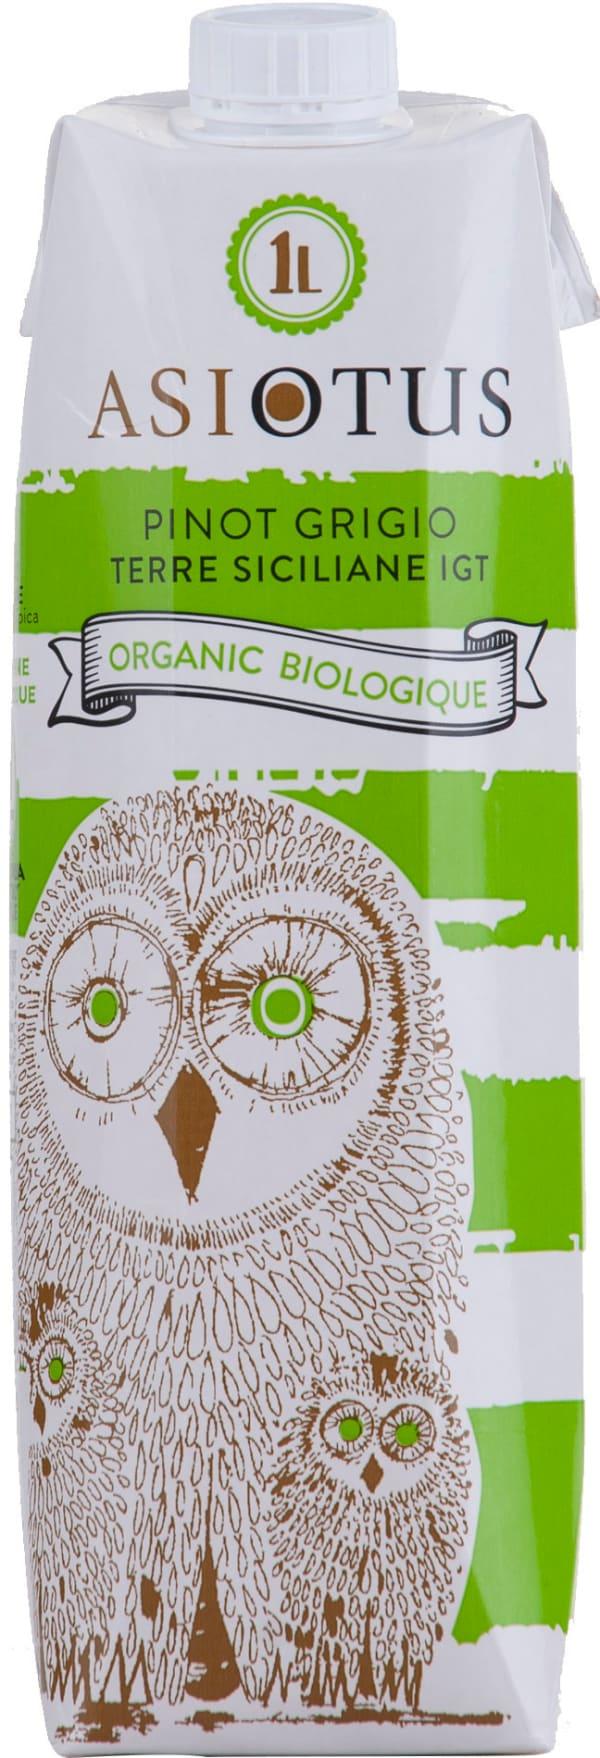 Asio Otus Pinot Grigio Organic 2016 kartongförpackning